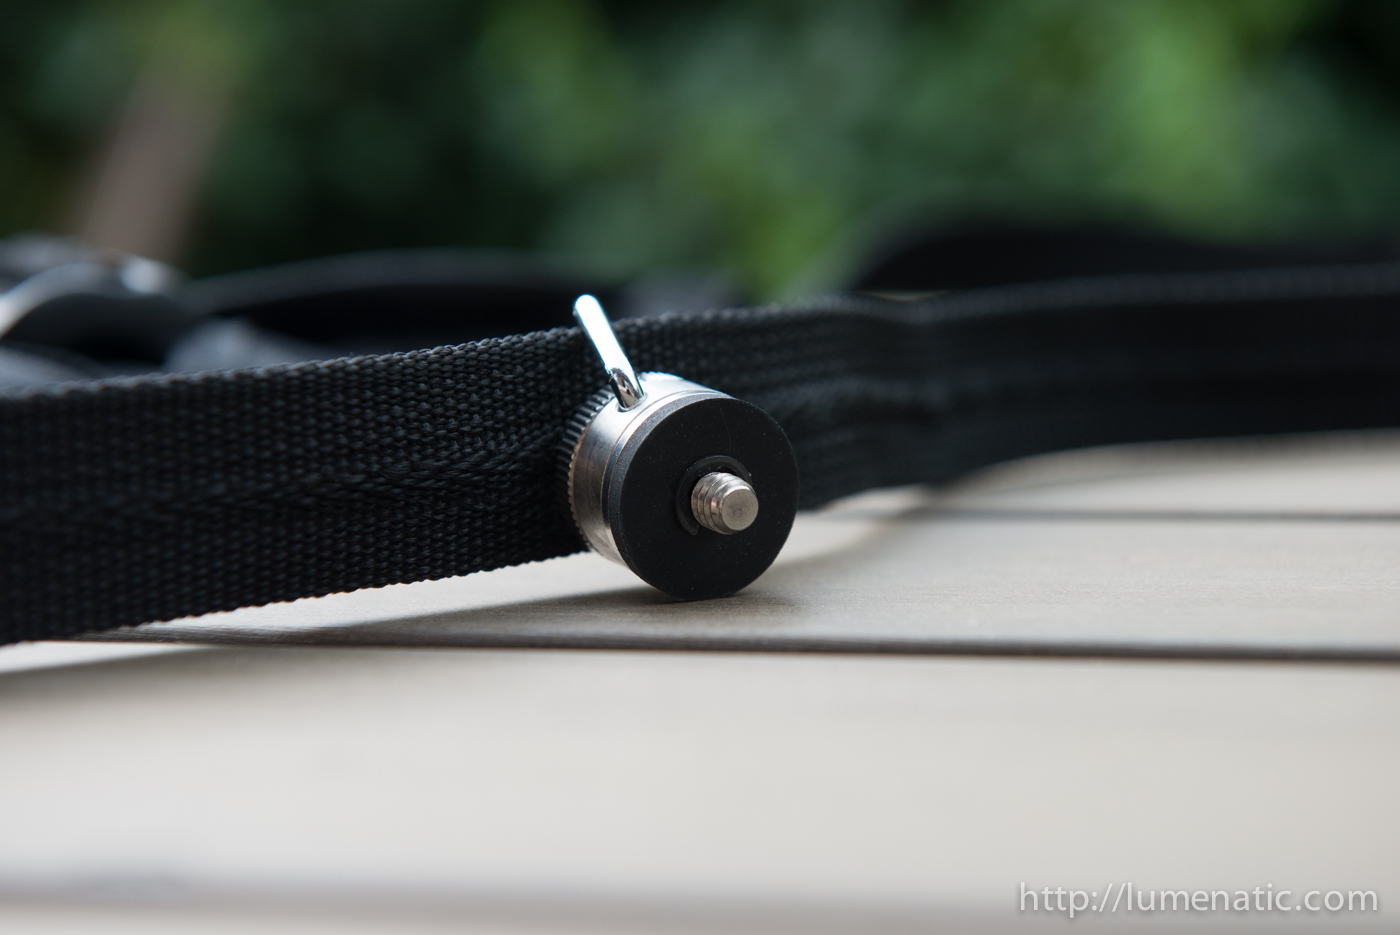 Comparing two popular camera straps